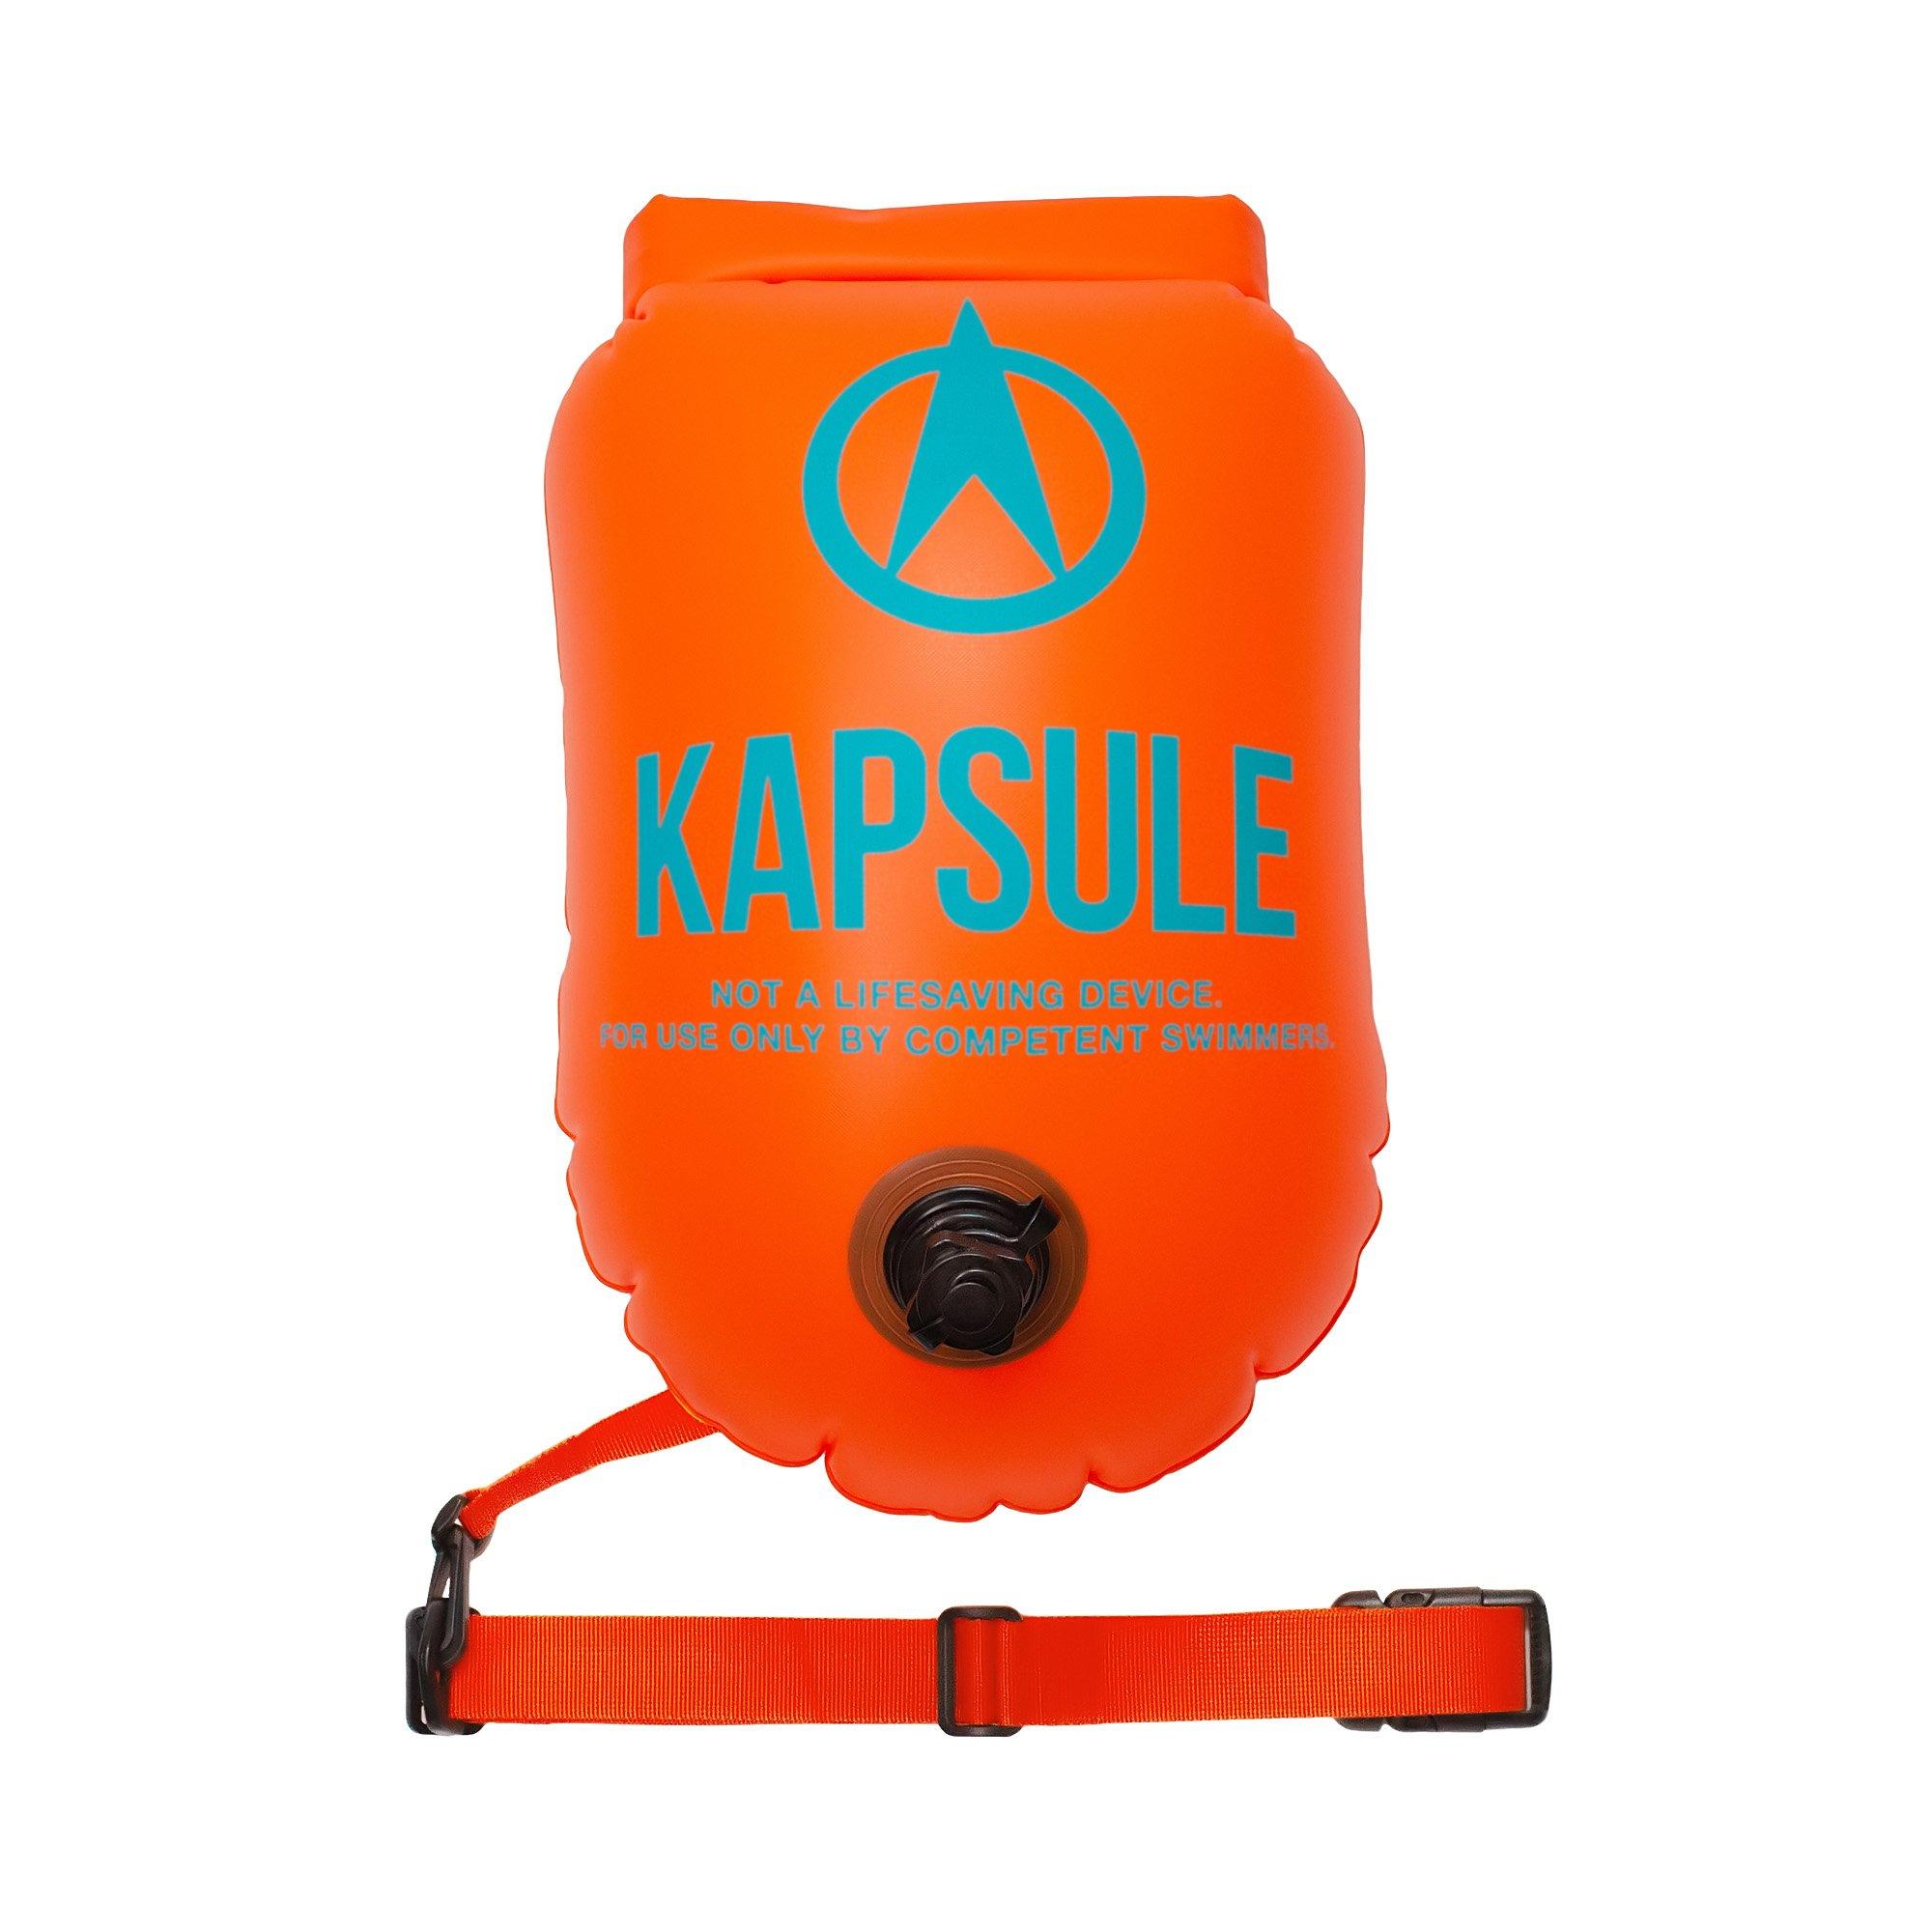 KAPSULE Swim Buoy (NEON 20L Orange) - Personal Swimming Float and Dry Bag by KAPSULE (Image #1)